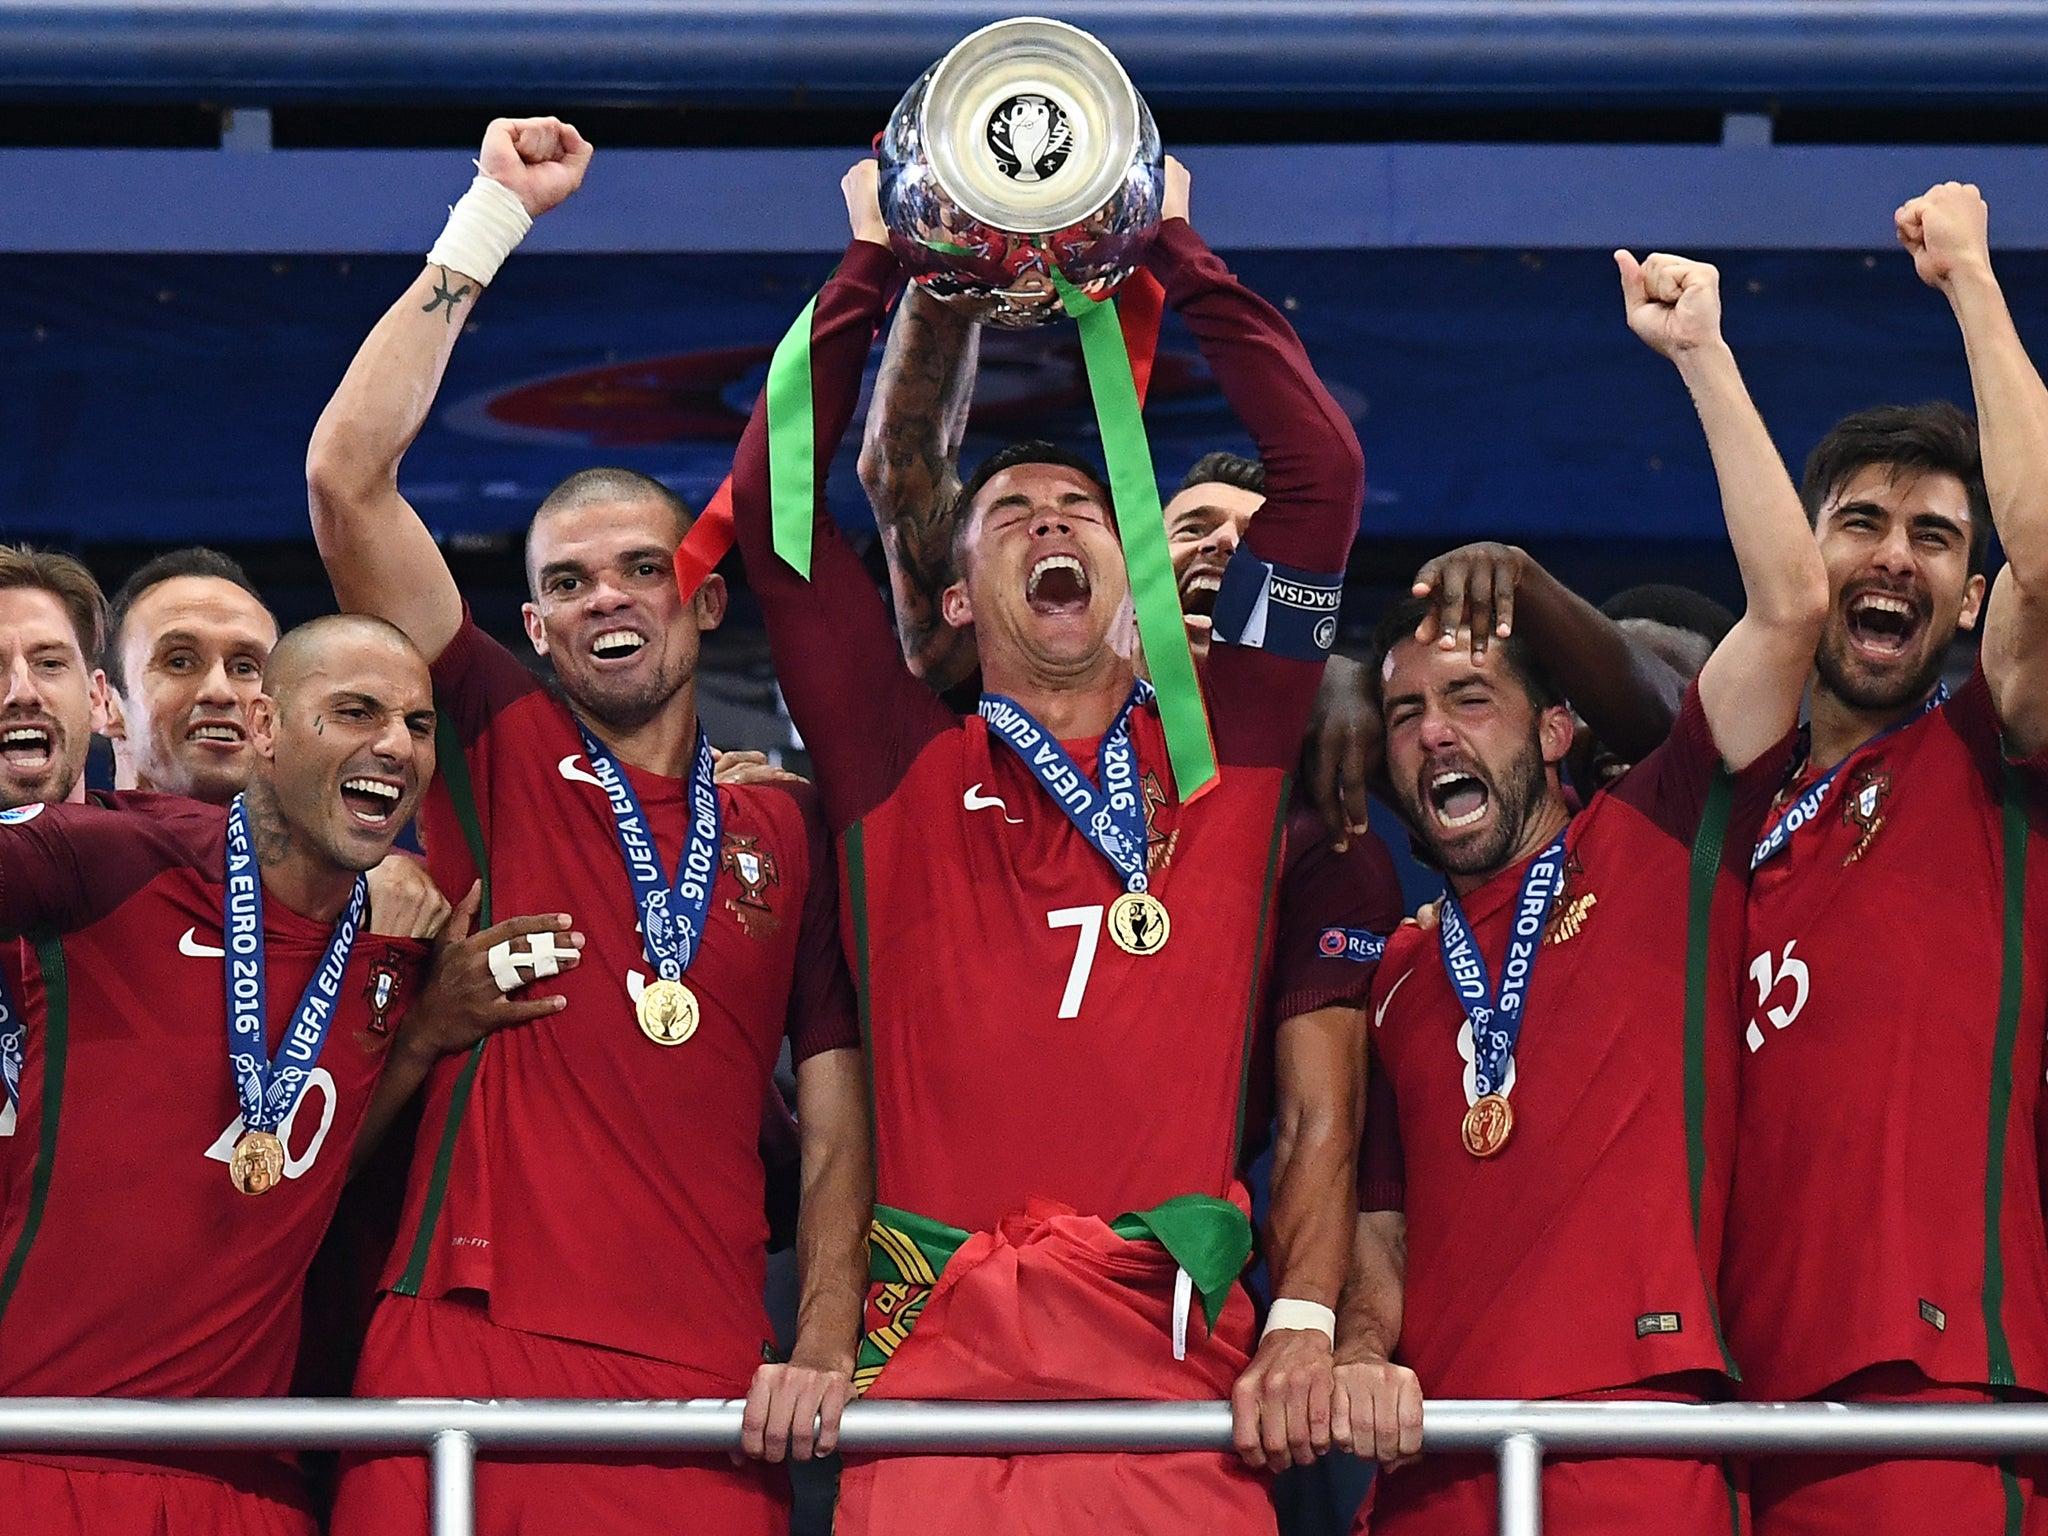 Ronaldo UEFA EURO 2016 Champions Portugal Soccer Jersey Patch